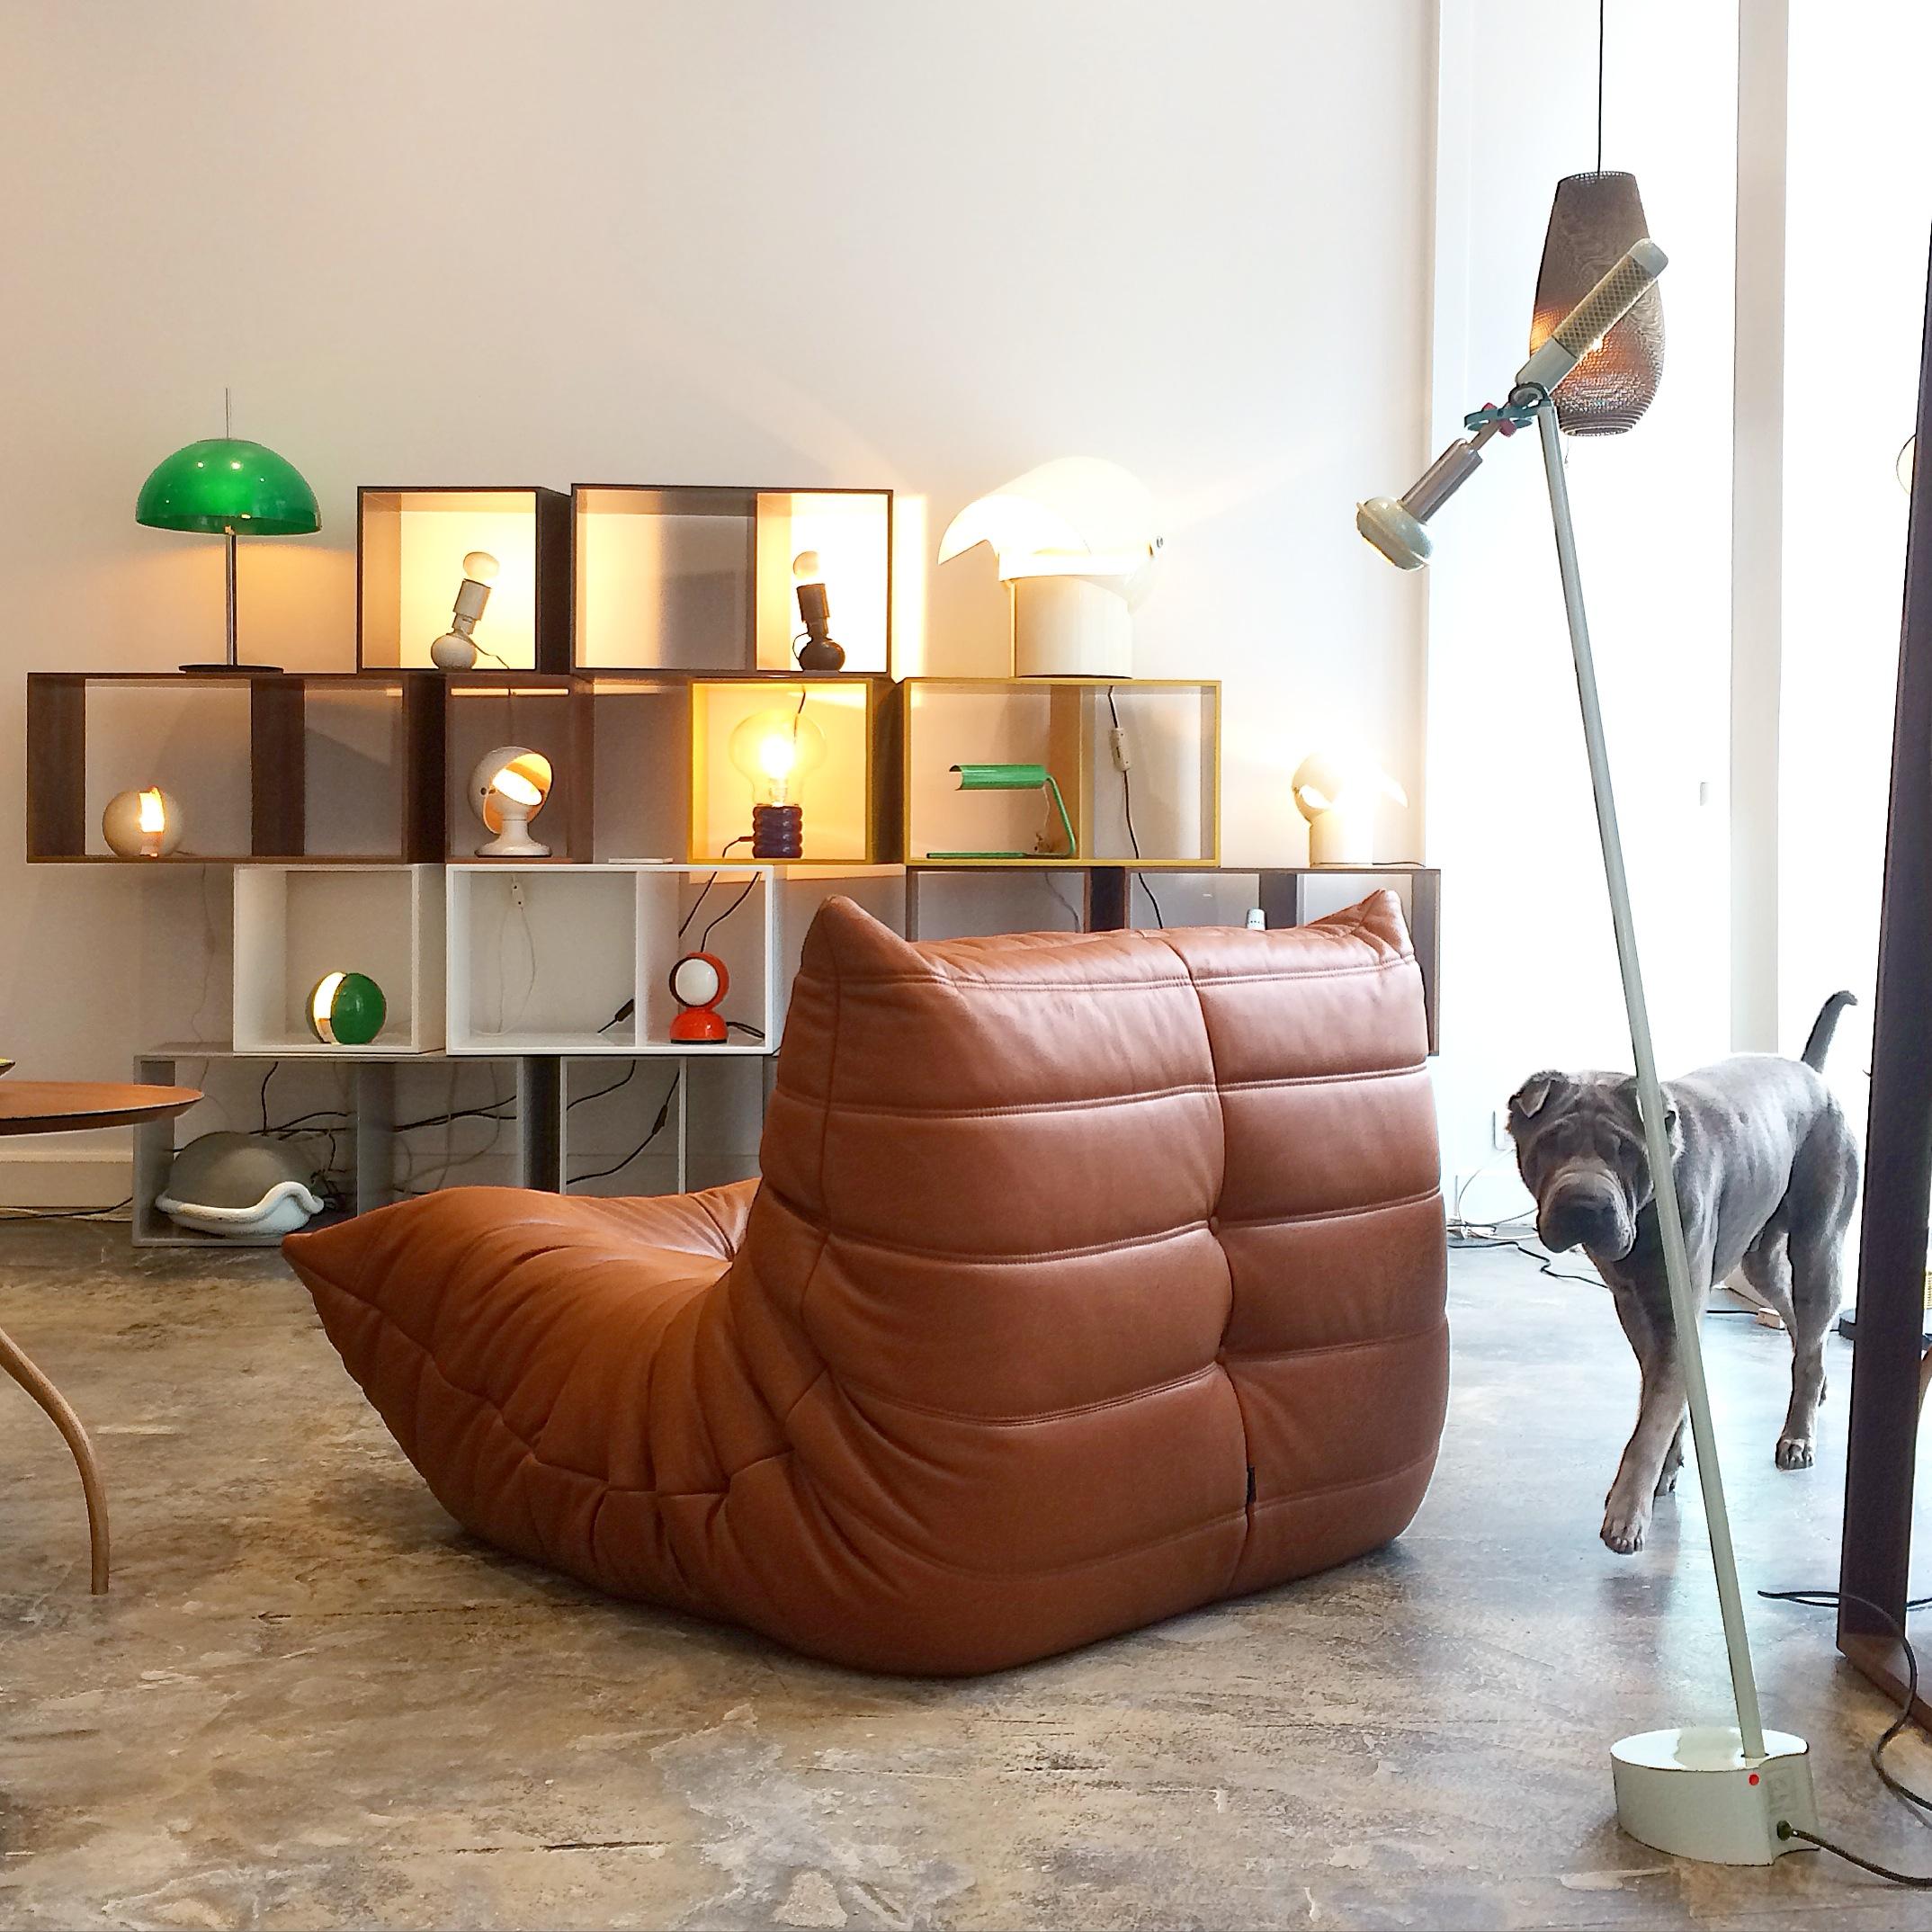 expo vente 50 luminaires de 1950 1980 the good old dayz ligne roset reaumur 1. Black Bedroom Furniture Sets. Home Design Ideas